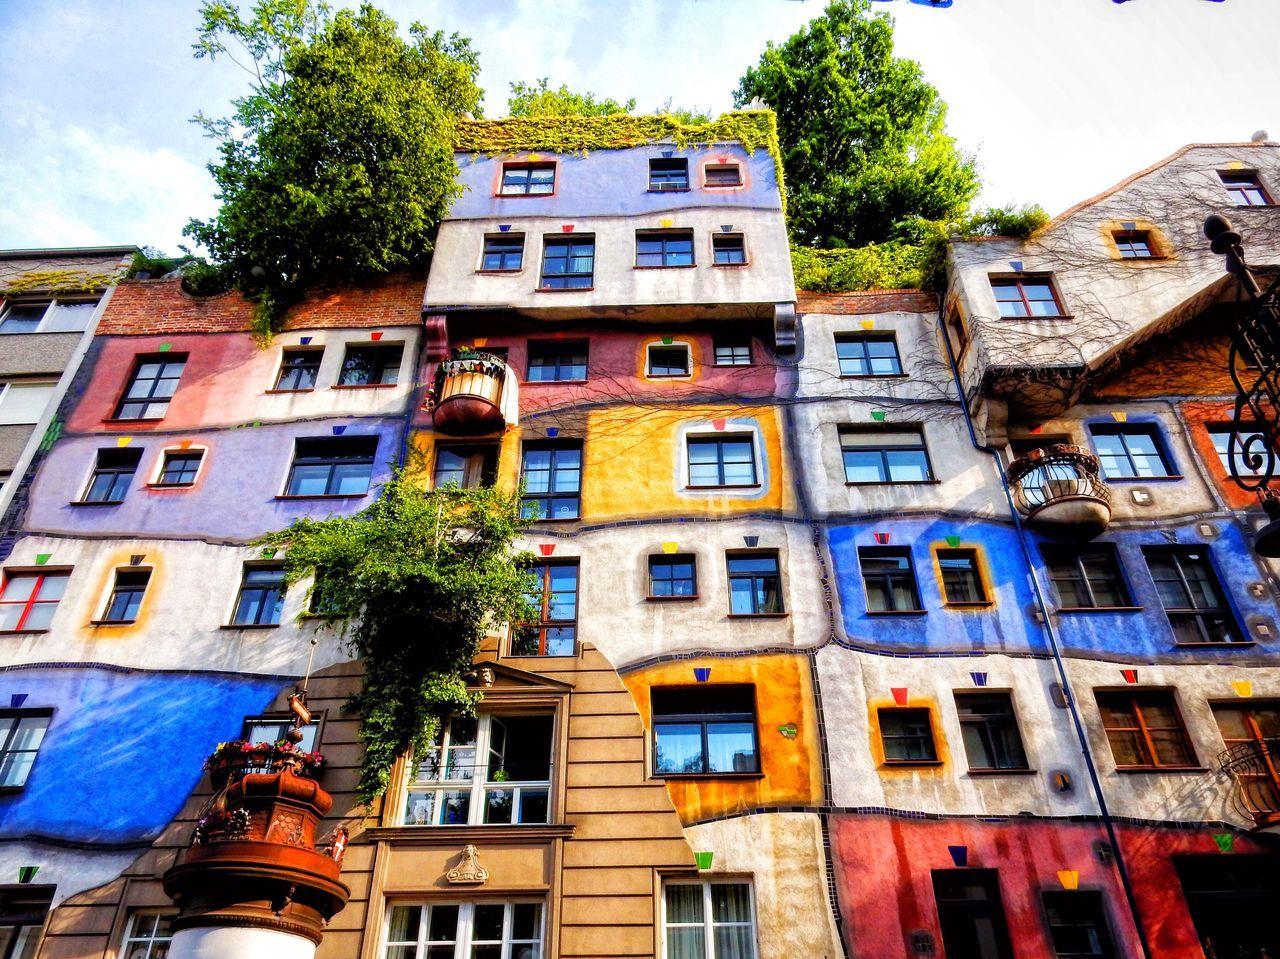 """Hundertwasserhaus"" Architecture House Discover Your City Travel Destinations Travel Adventure Explore Landscape Wanderlust Discovery Photography Vienna Europe"